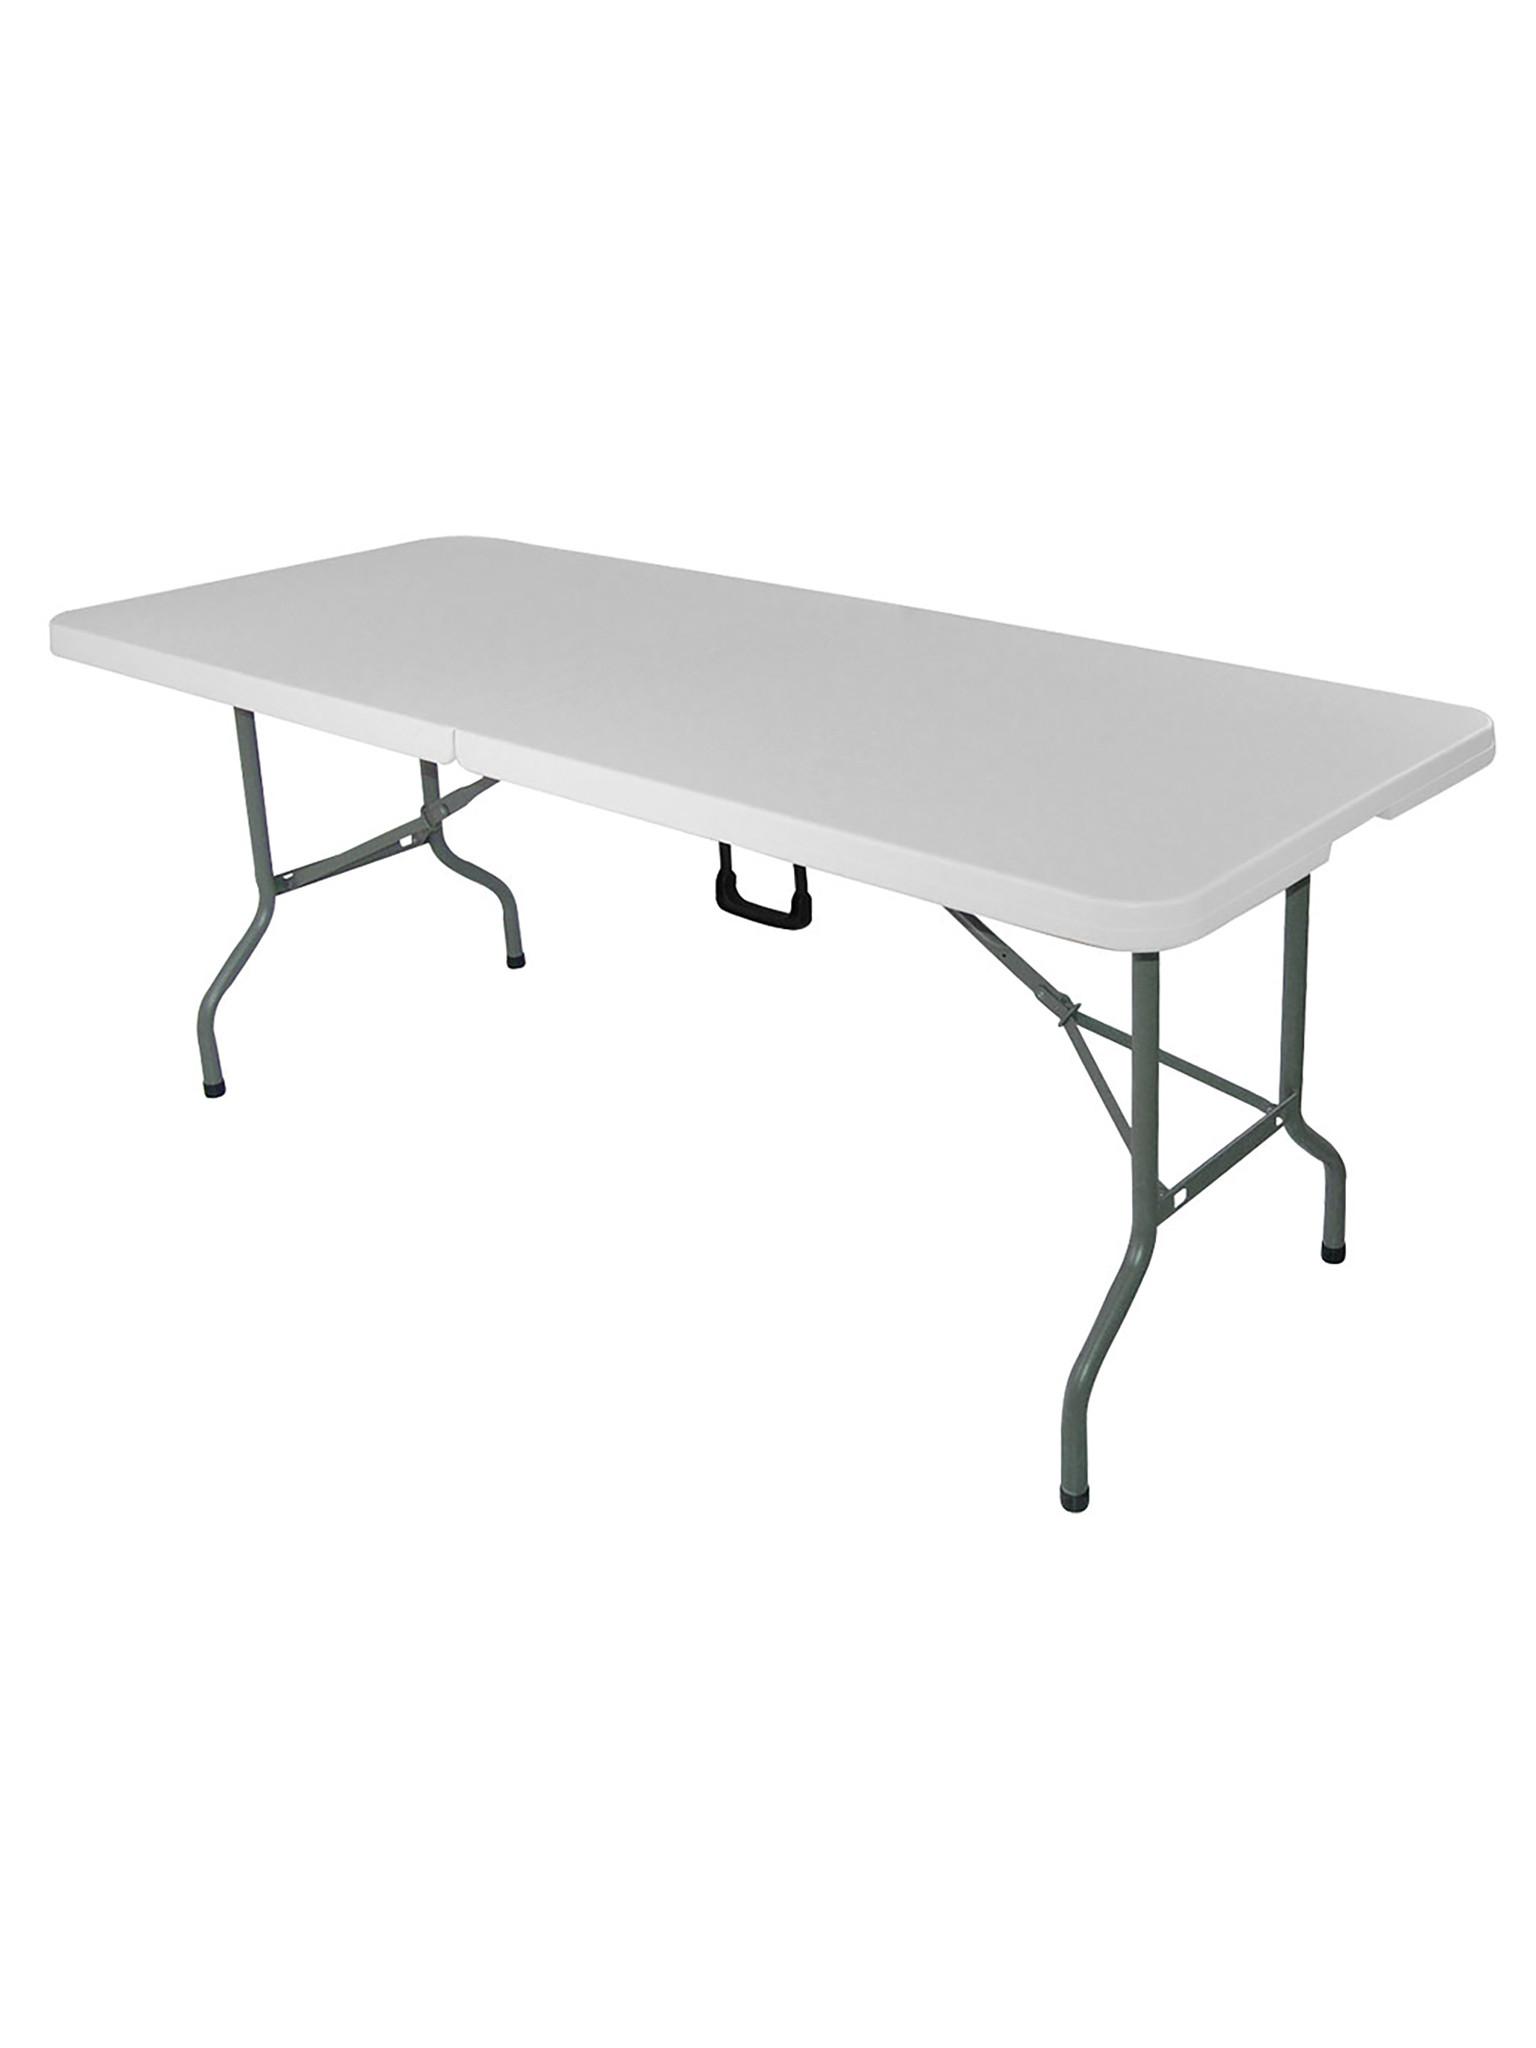 Inklapbare tafel - Rechthoek - H 74 x 184 x 75 Cm - Promoline